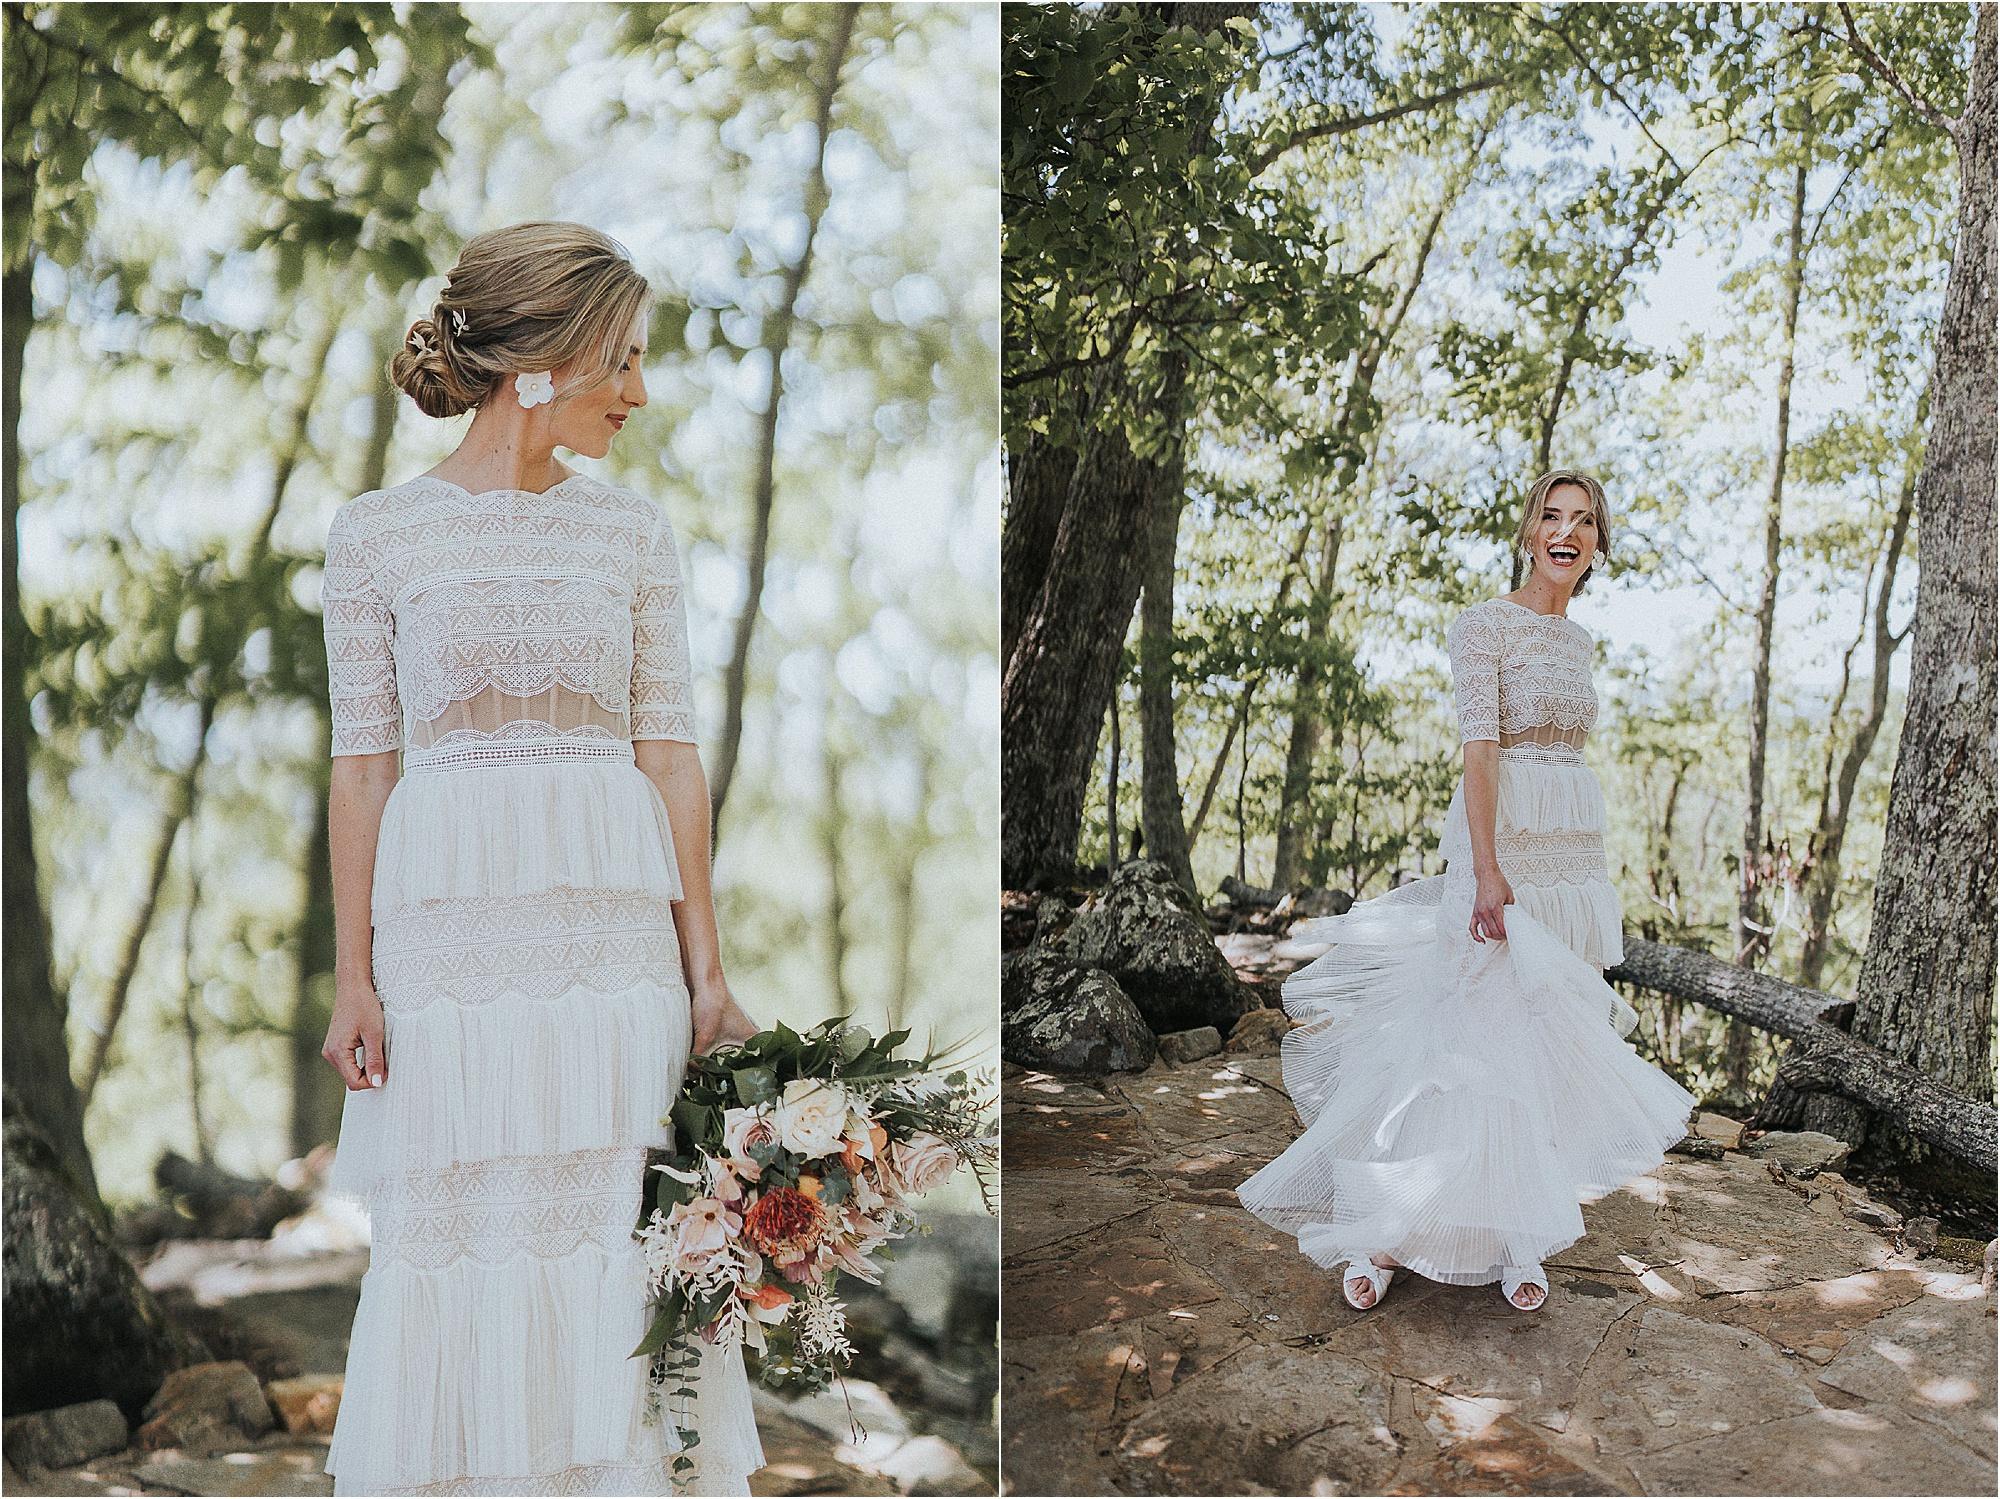 bride in unique wedding dress with fringe